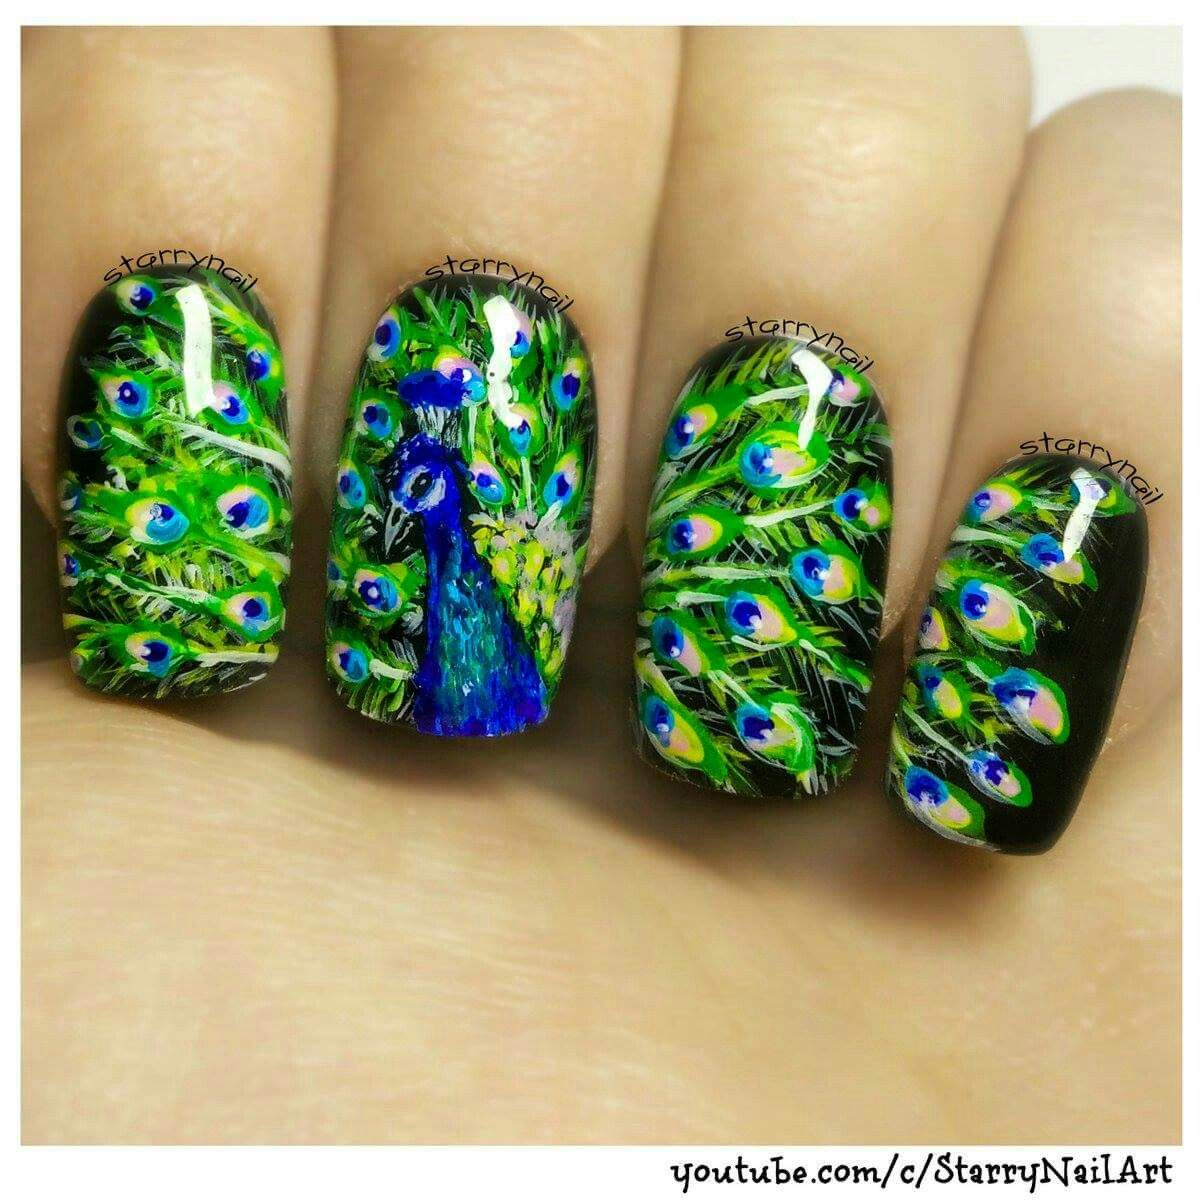 Pin de paula aguirre en nails | Pinterest